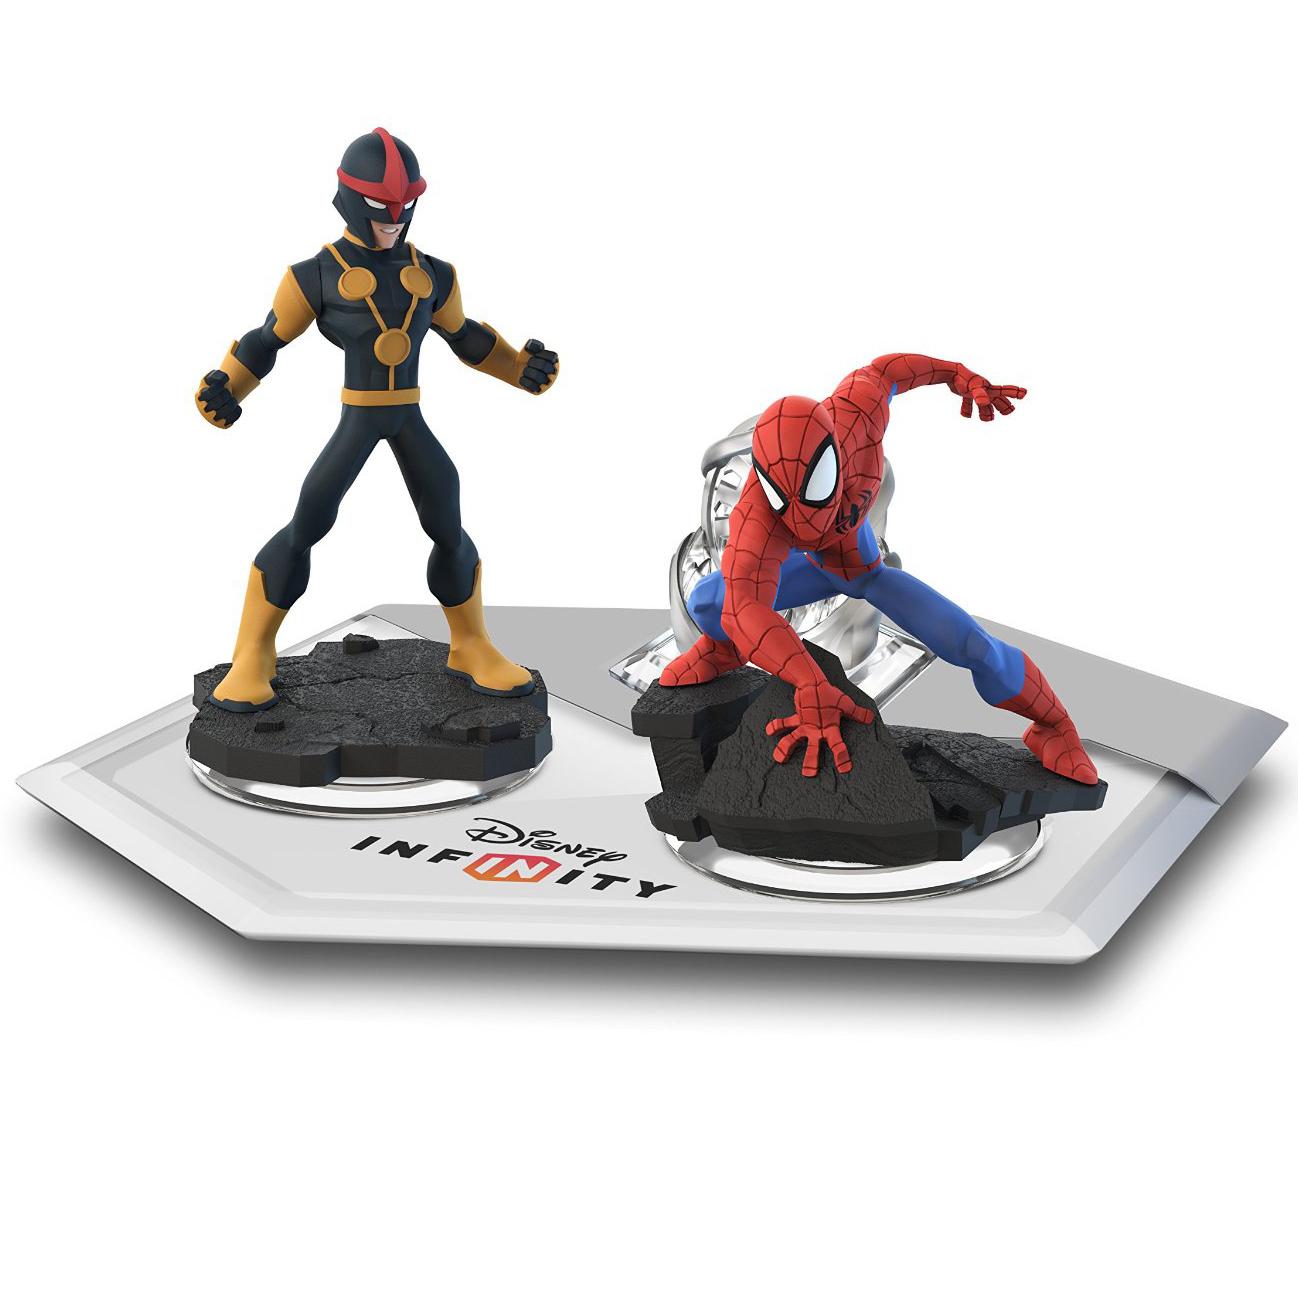 Overstock.com - Disney INFINITY:  Marvels Ultimate Spider-Man Playset $17.92